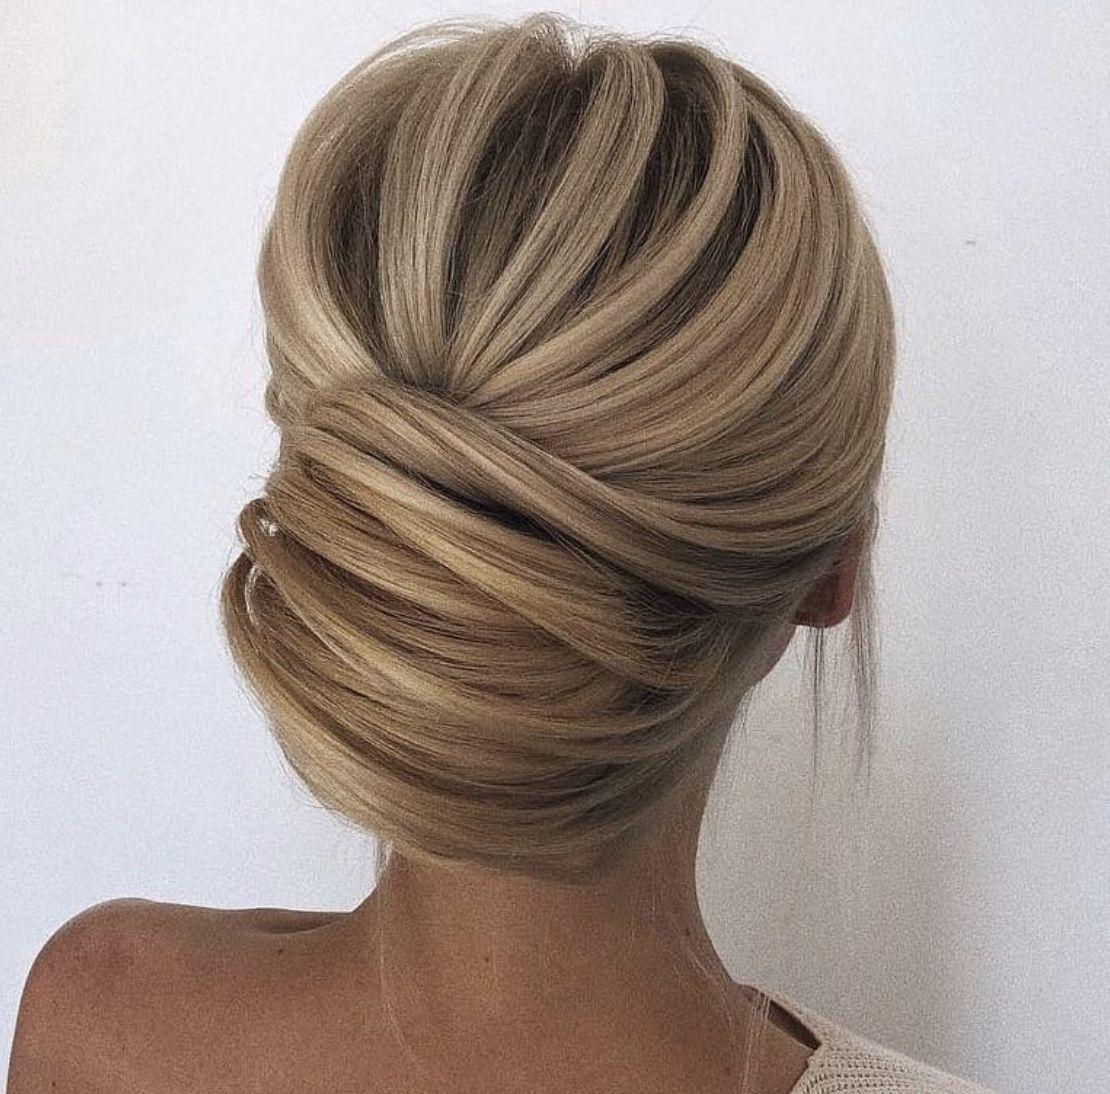 Pin by karen gannon on hair pretties pinterest